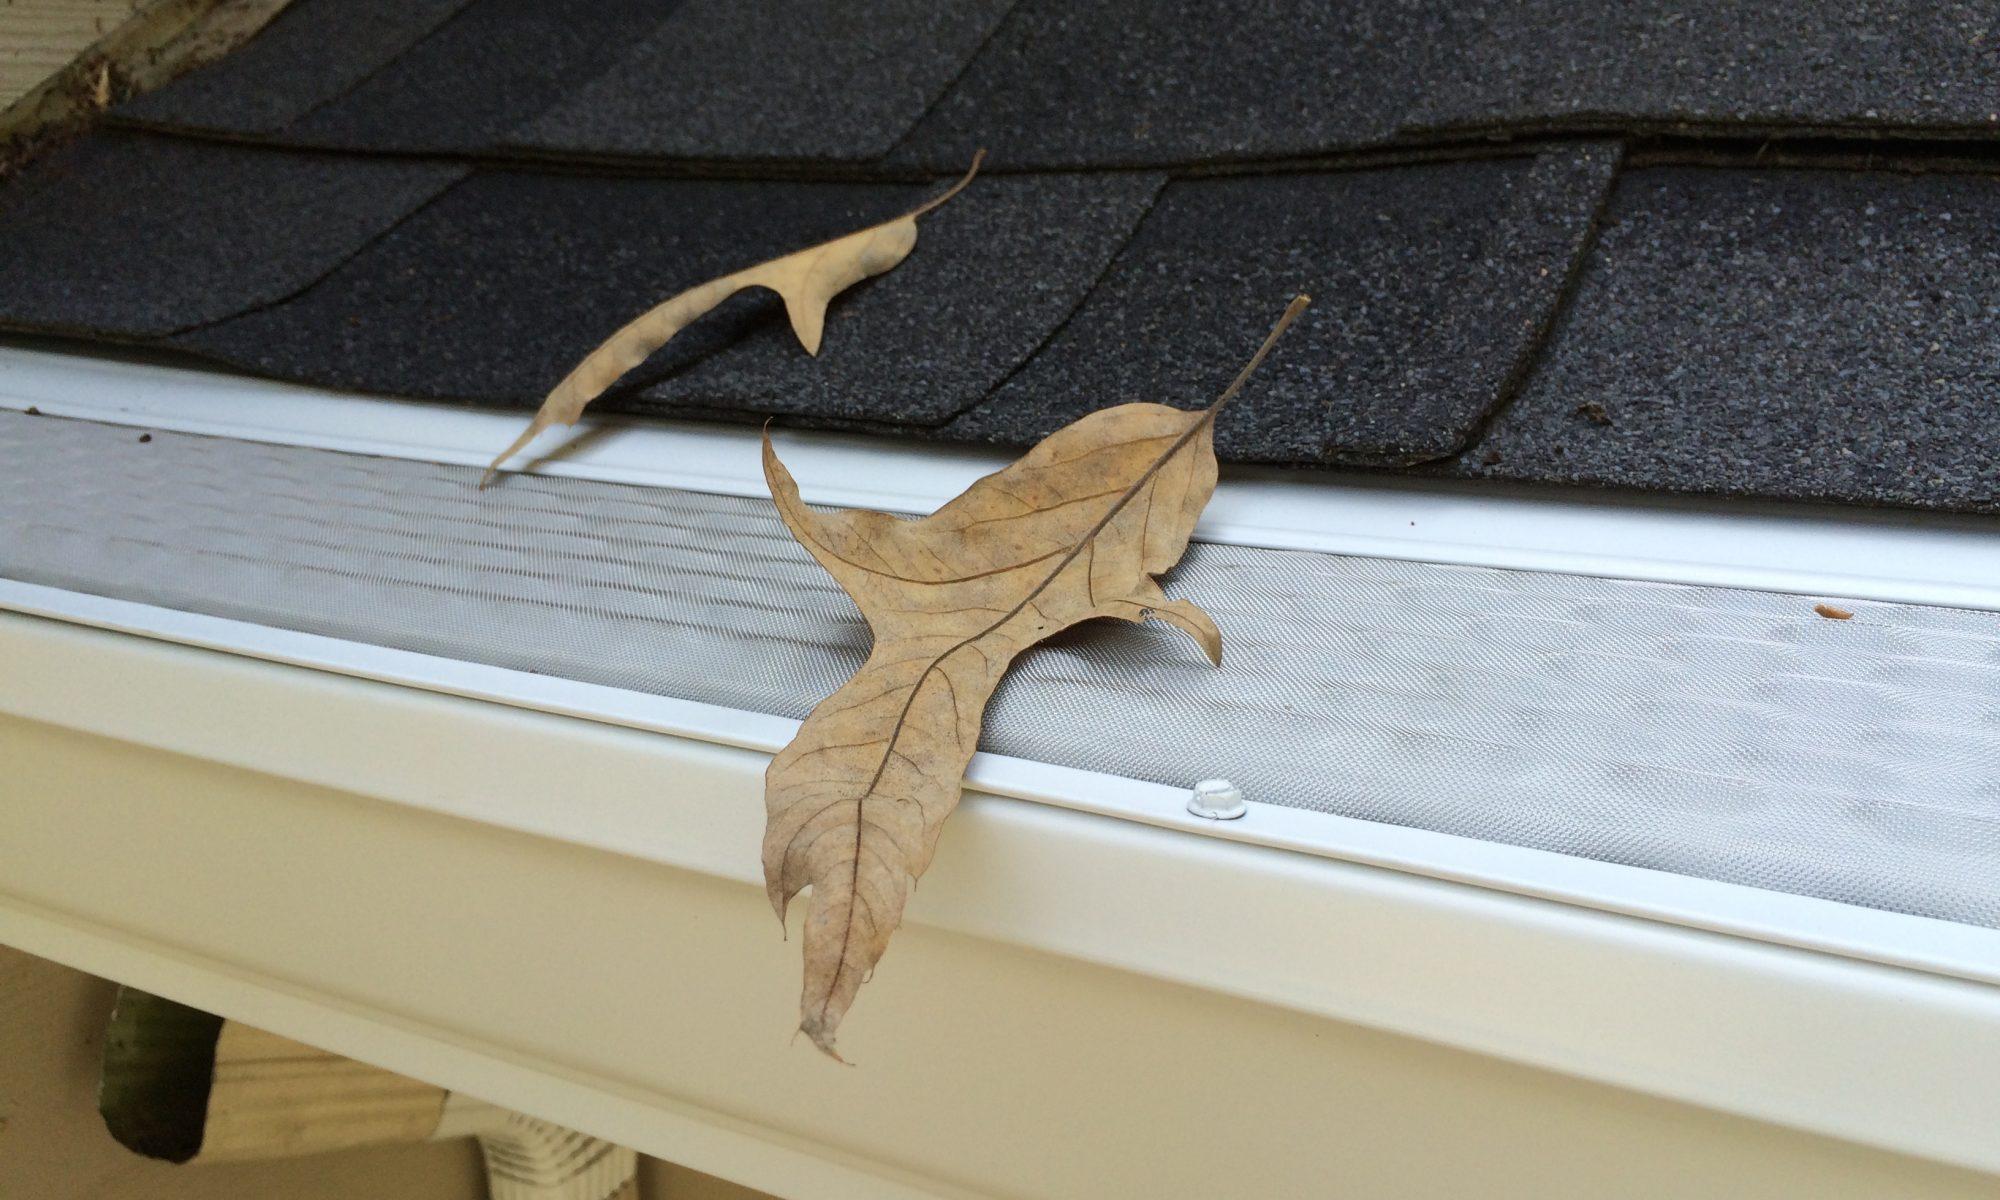 microscreen u.s. gutter guard installed on new 6 inch gutters